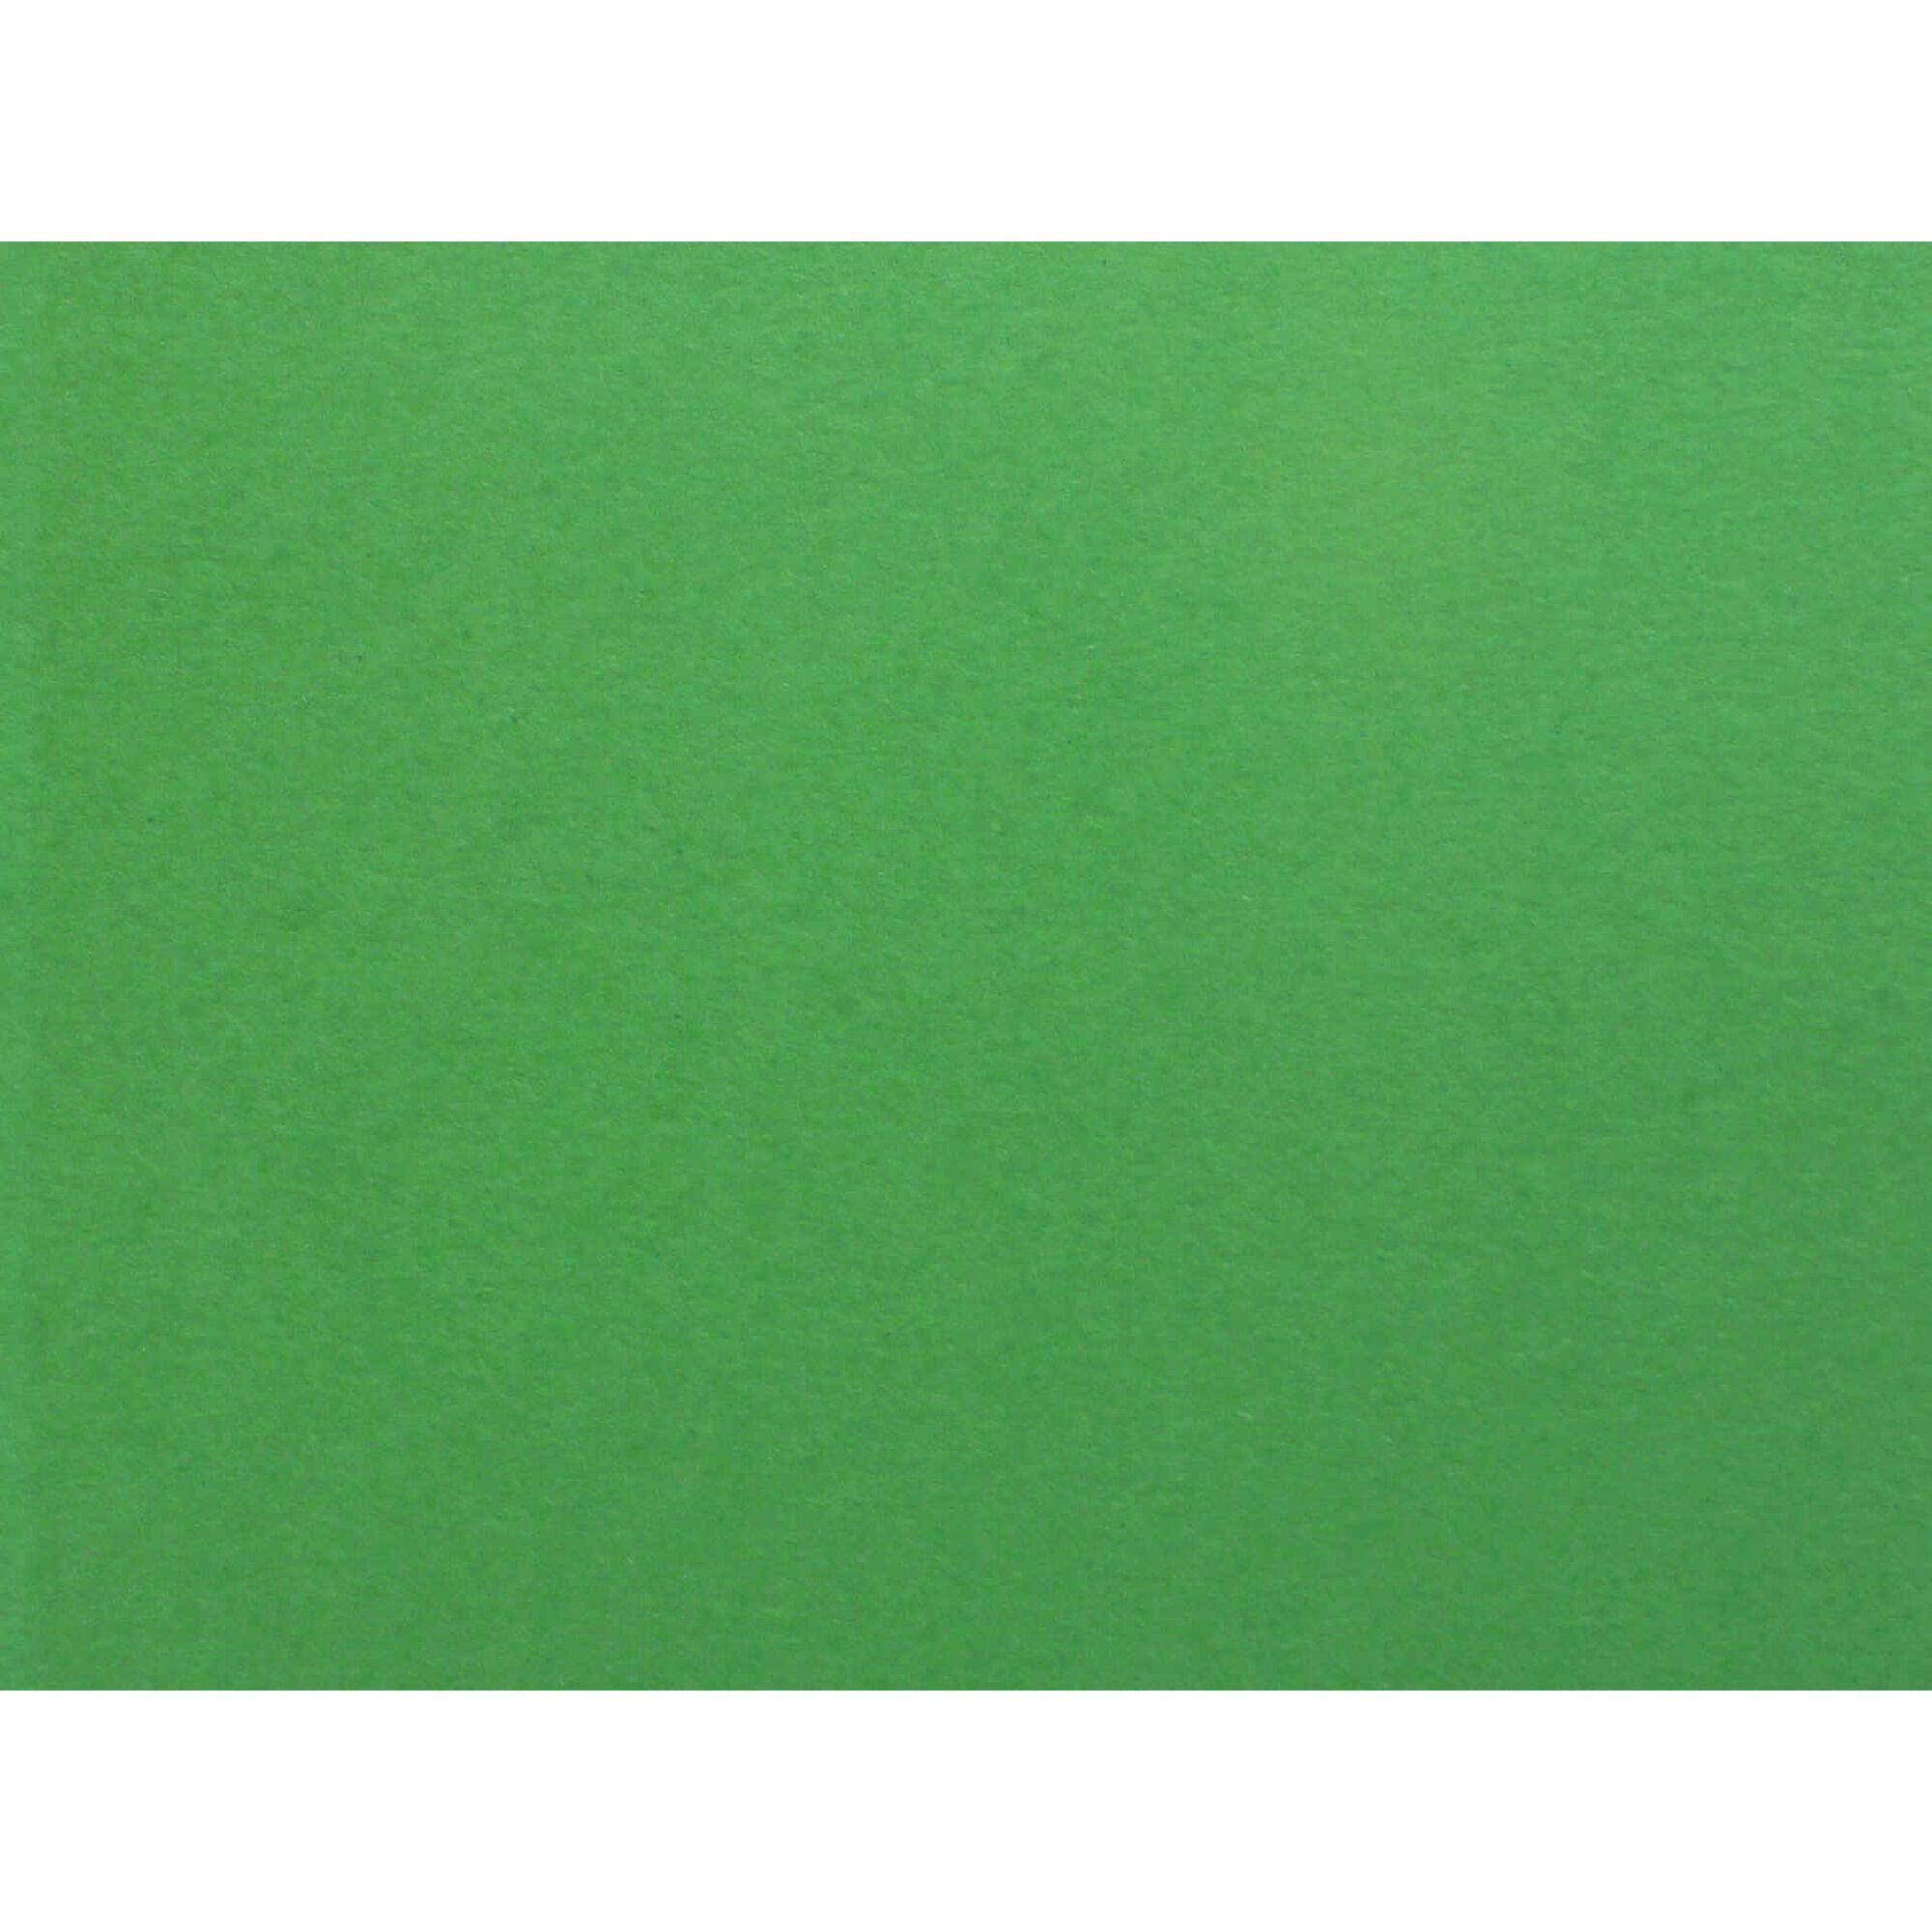 Cartolina Verde Intenso 50x65cm